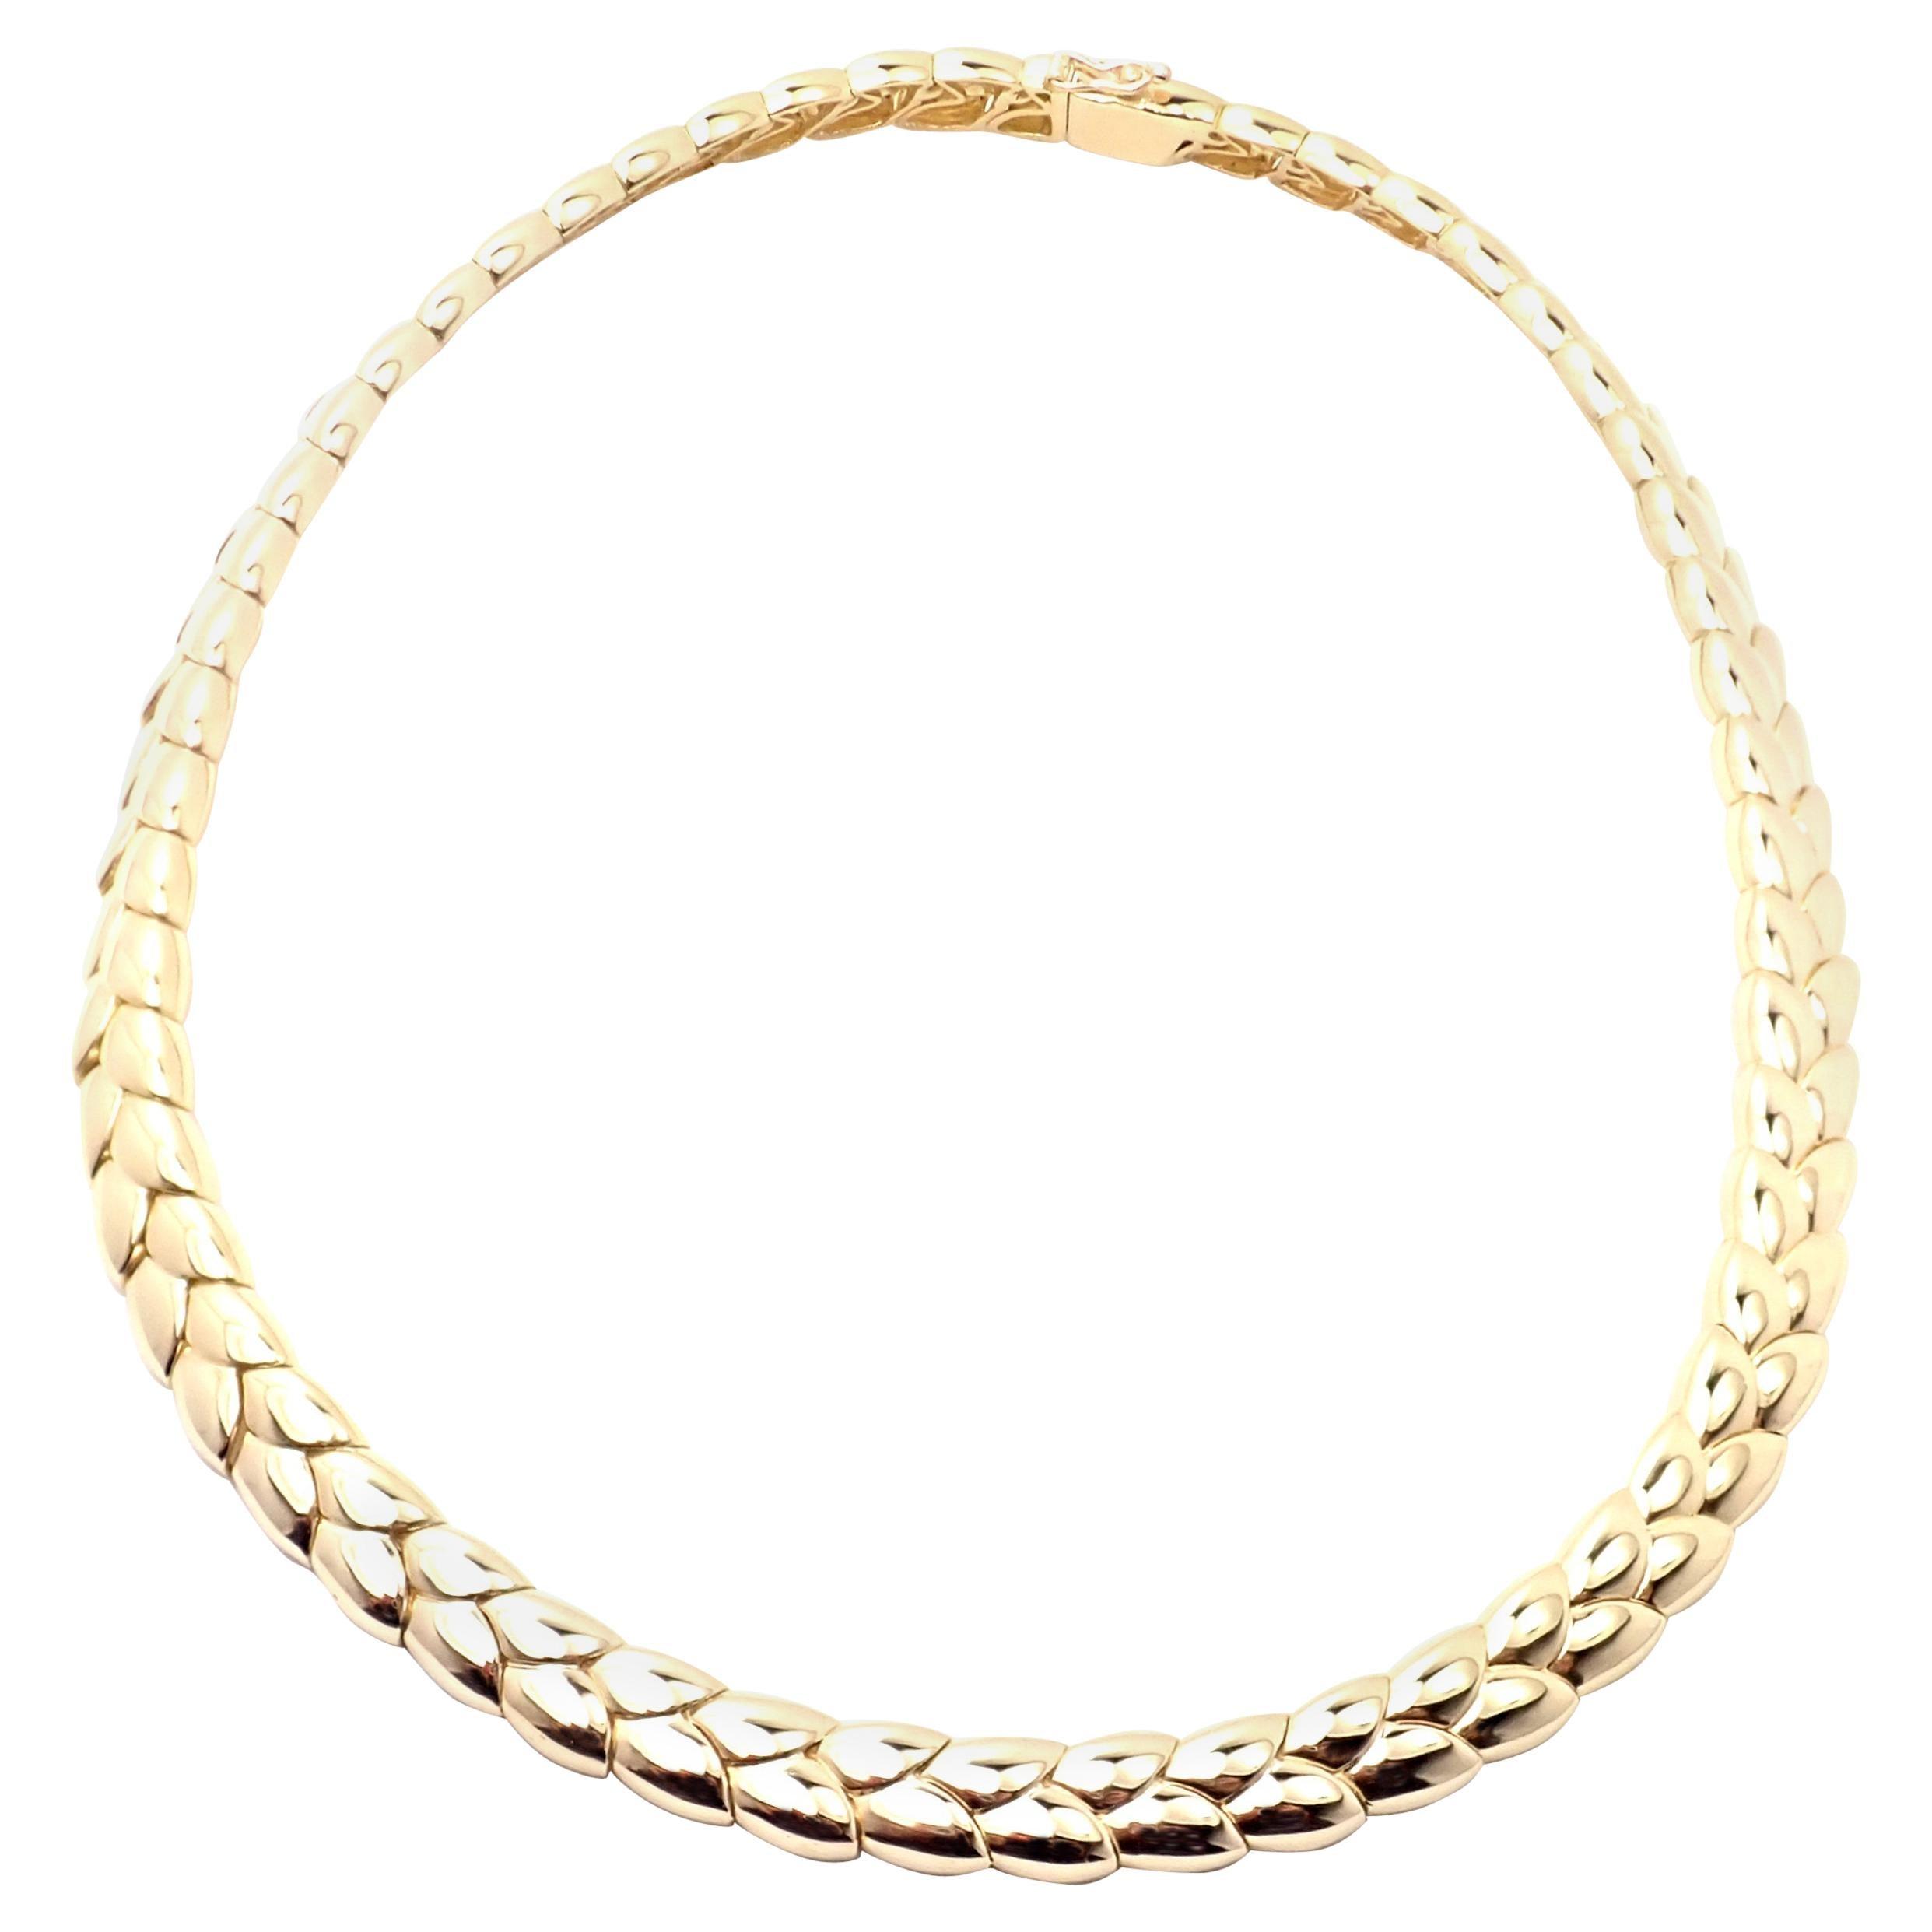 Vintage Van Cleef & Arpels Yellow Gold Choker Necklace